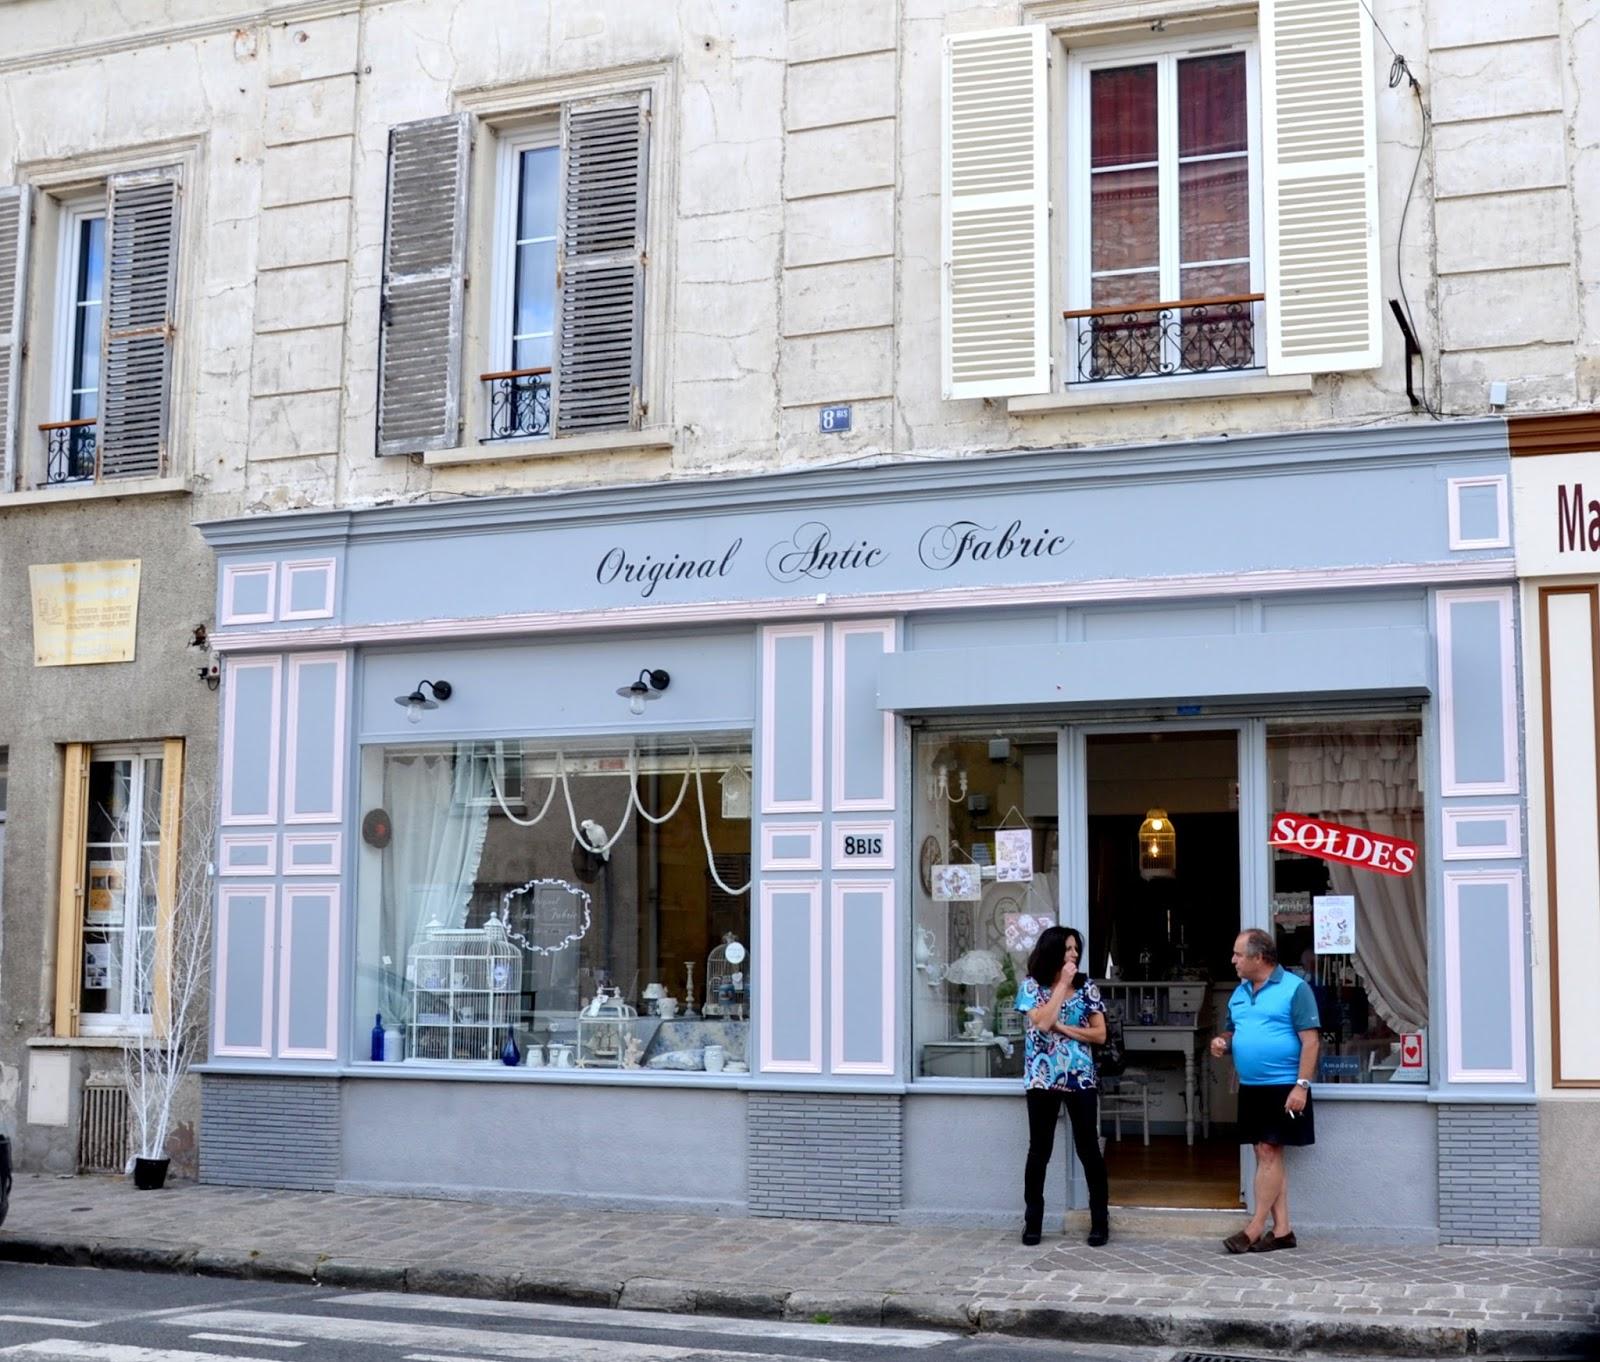 cool rue du commerce cuisine rue du commerce boutique with cuisine rue du commerce. Black Bedroom Furniture Sets. Home Design Ideas